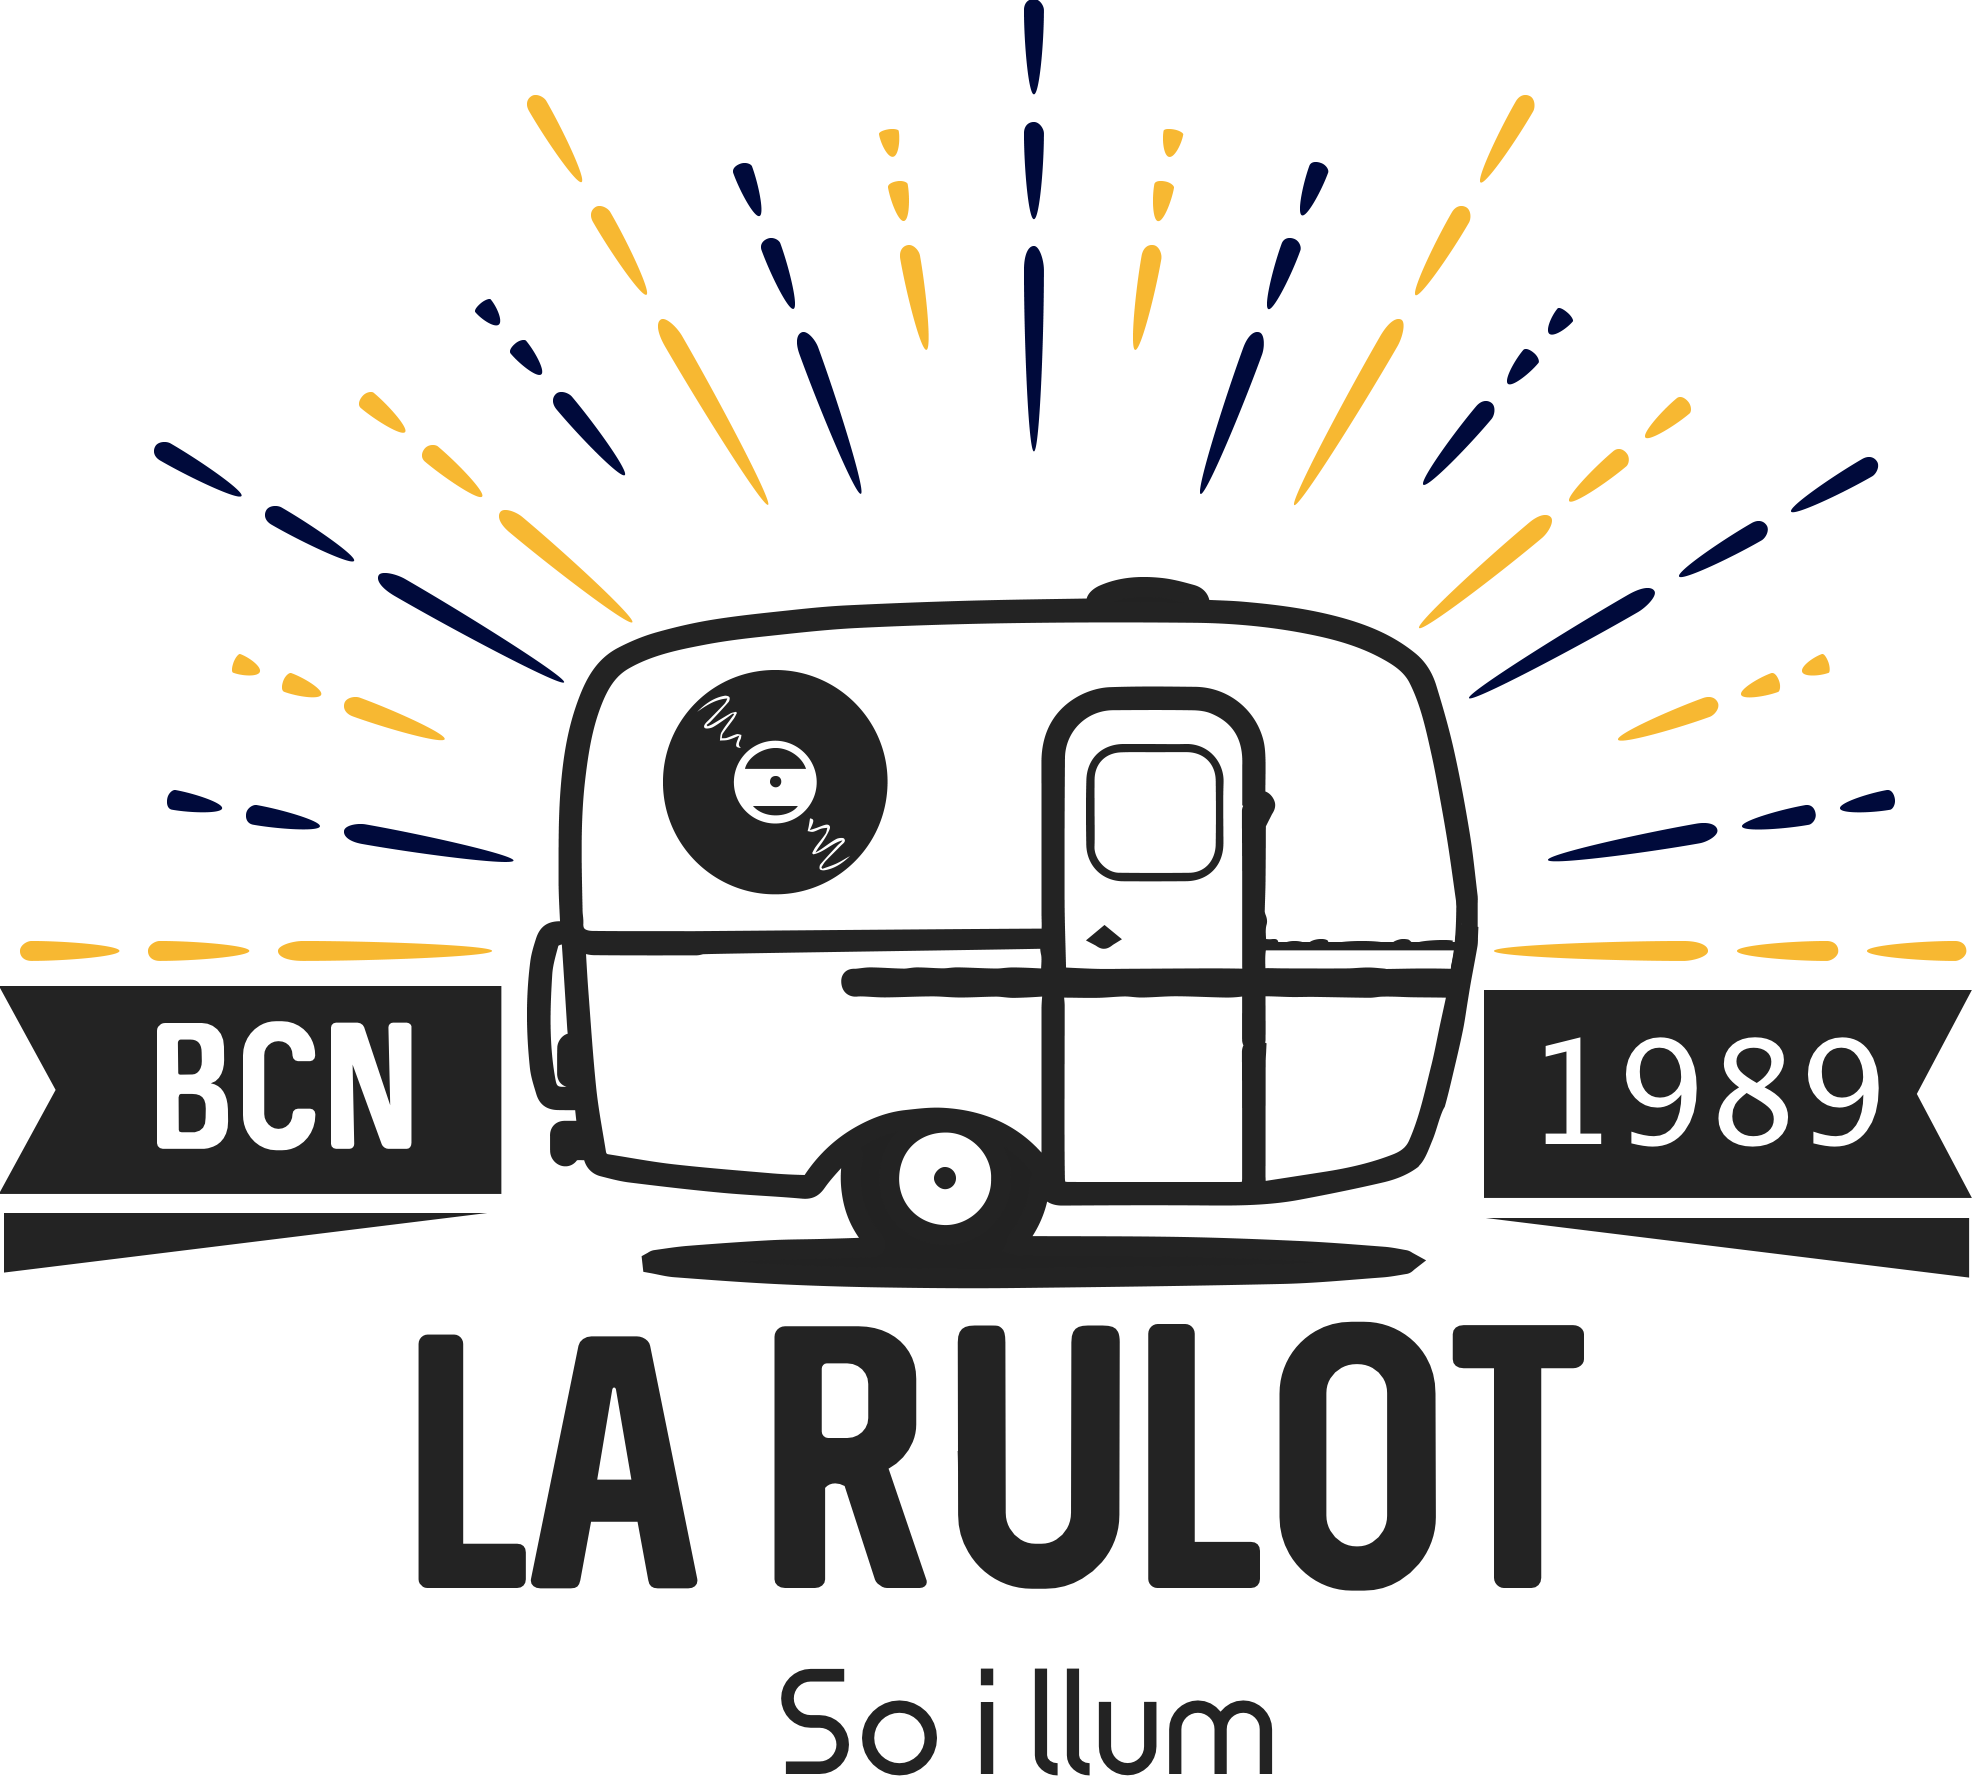 la_rulot_principal